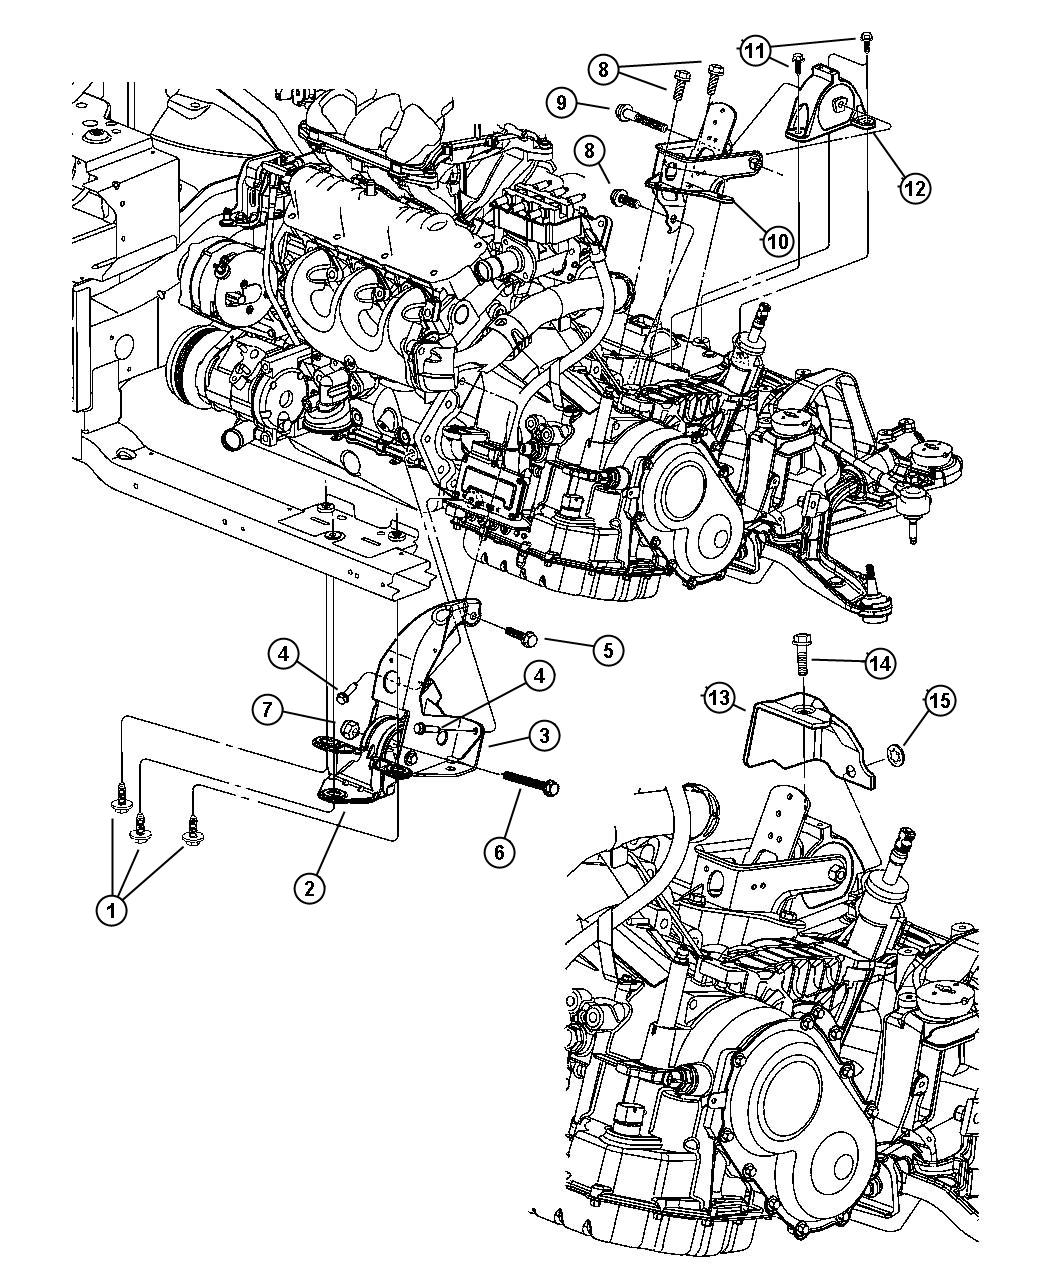 dodge grand caravan parts diagram 1999 acura tl stereo wiring 2008 sliding door